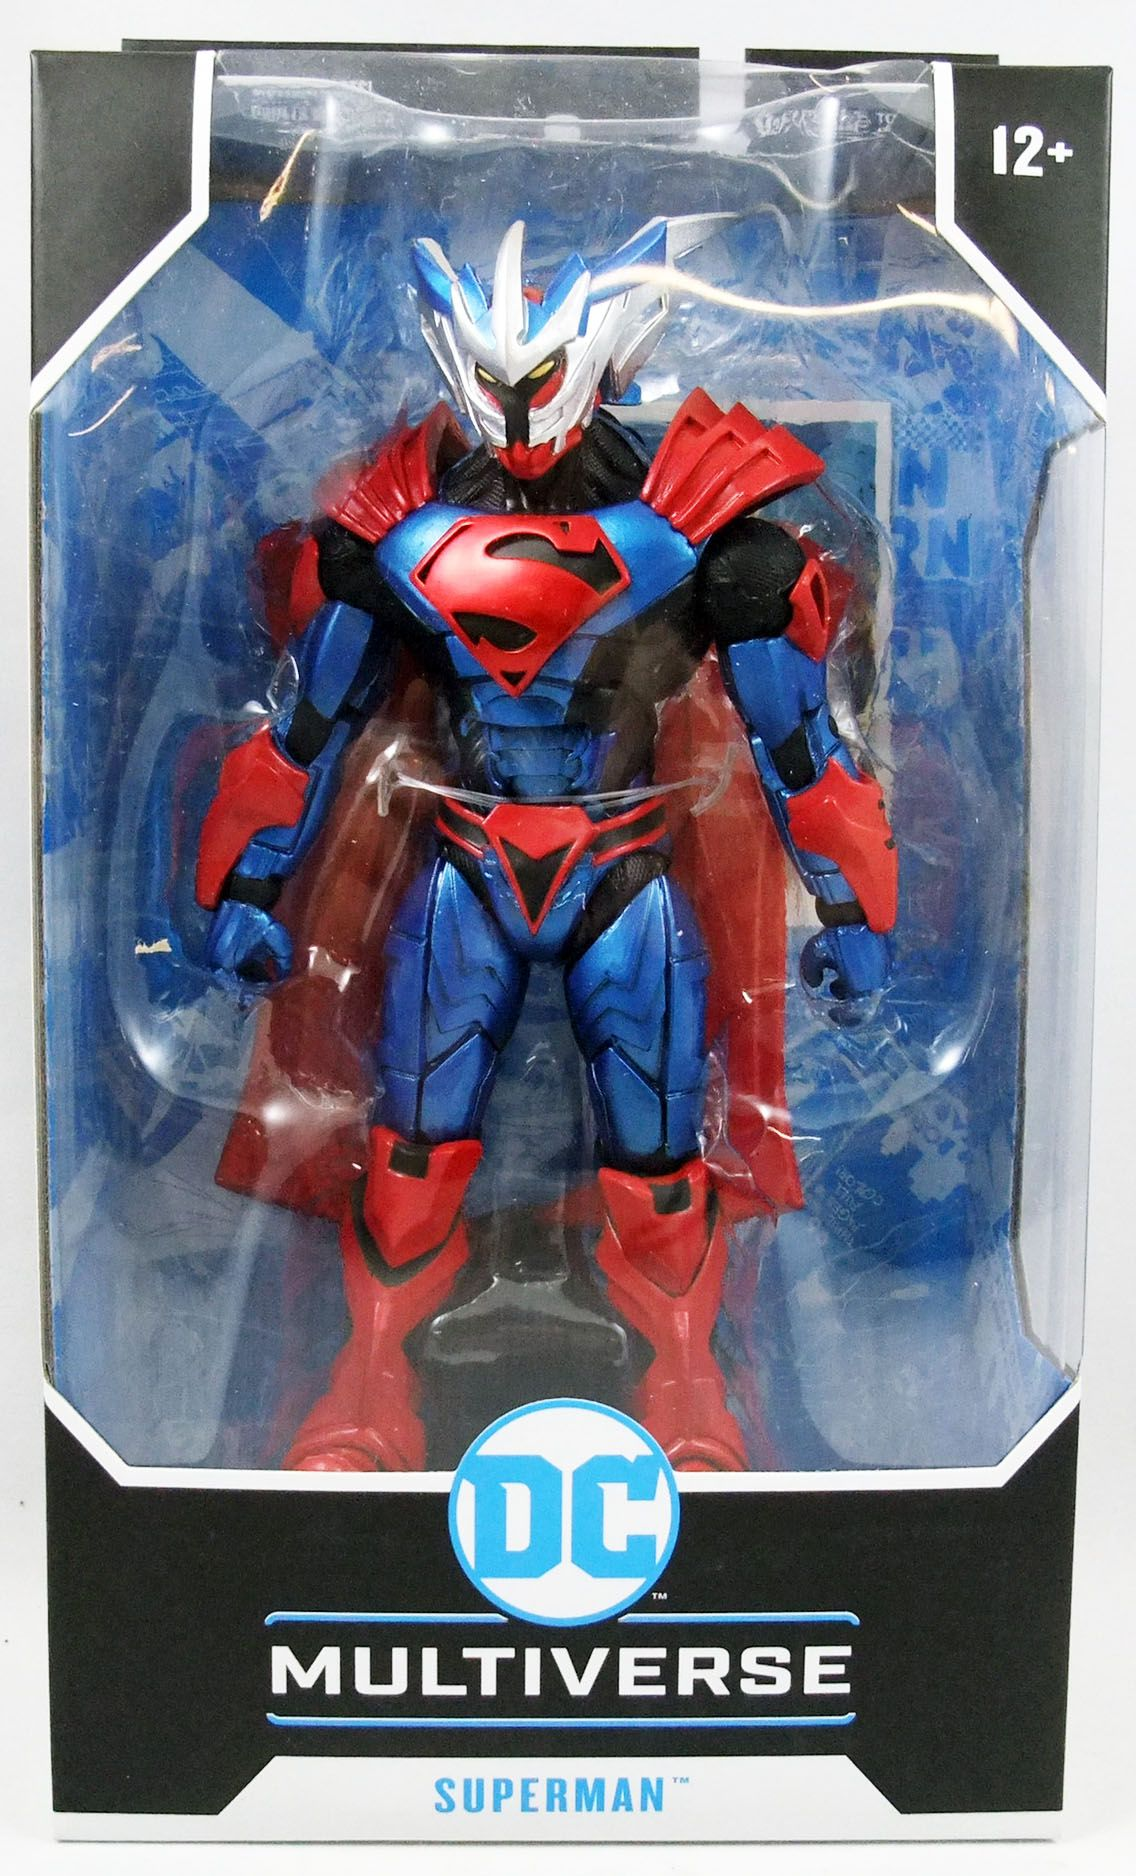 environ 17.78 cm DC Multi-Univers Unchained Armor Superman 7 in Action Figure de Collection